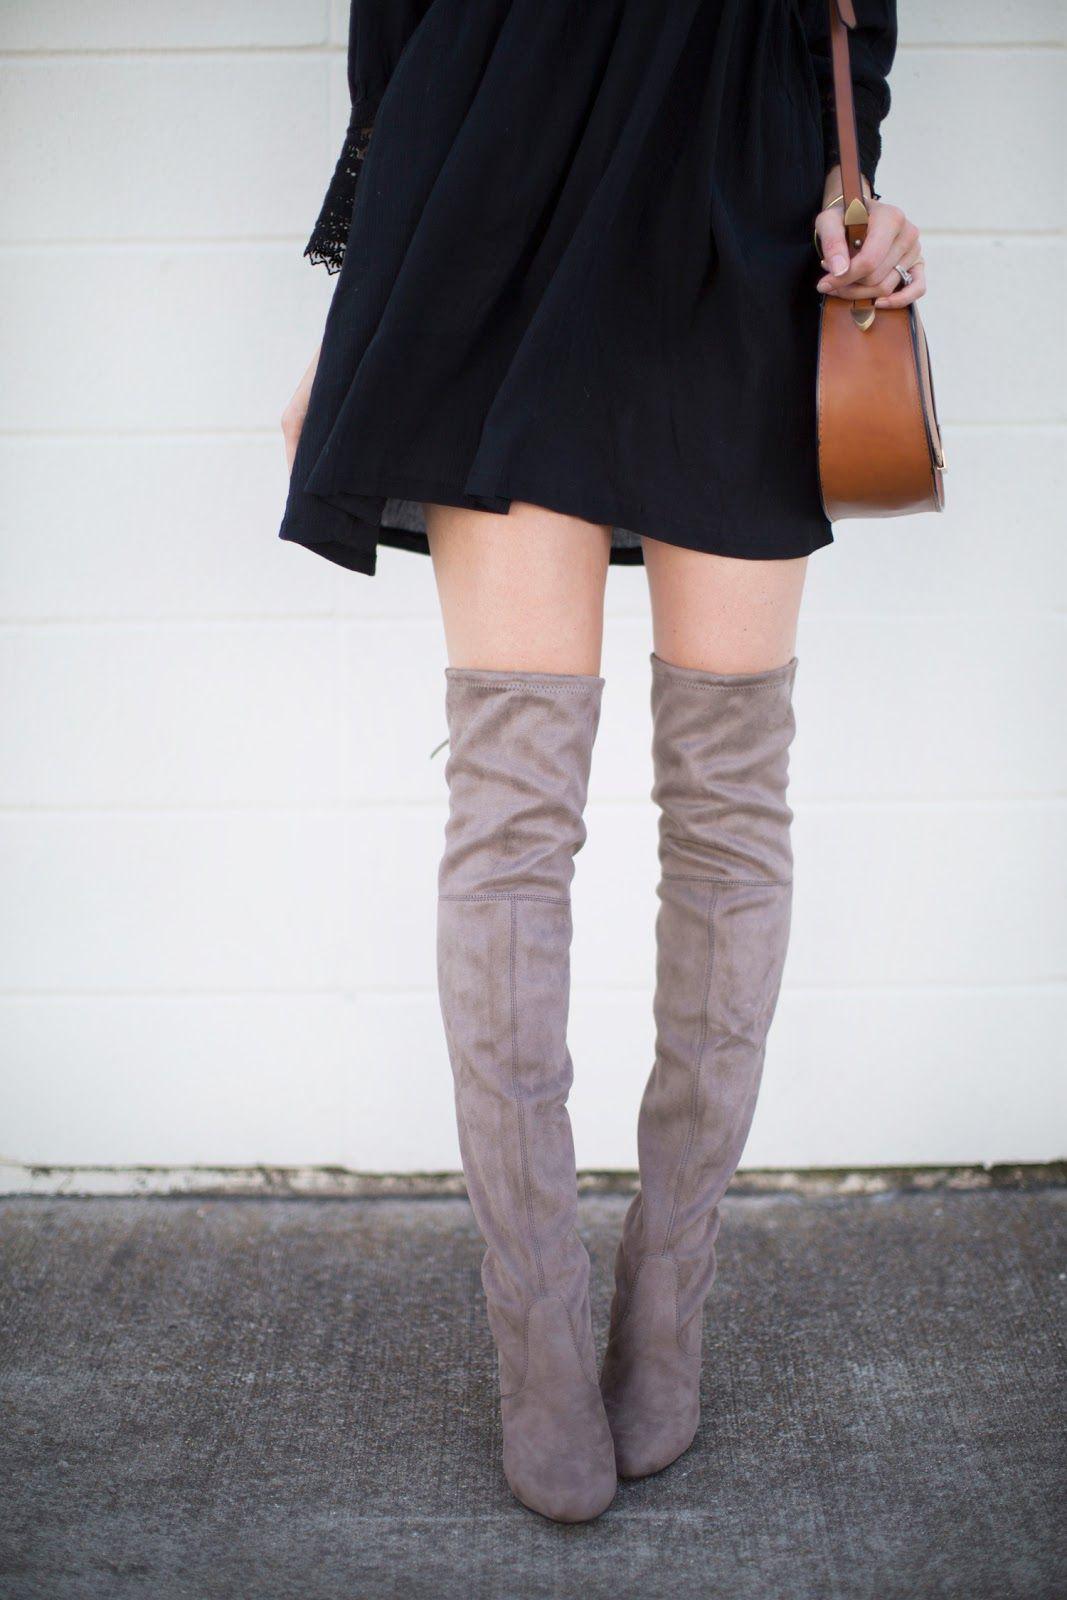 cordura proporción Sympton  Love, Lenore | High fashion street style, Clothes, Cute outfits